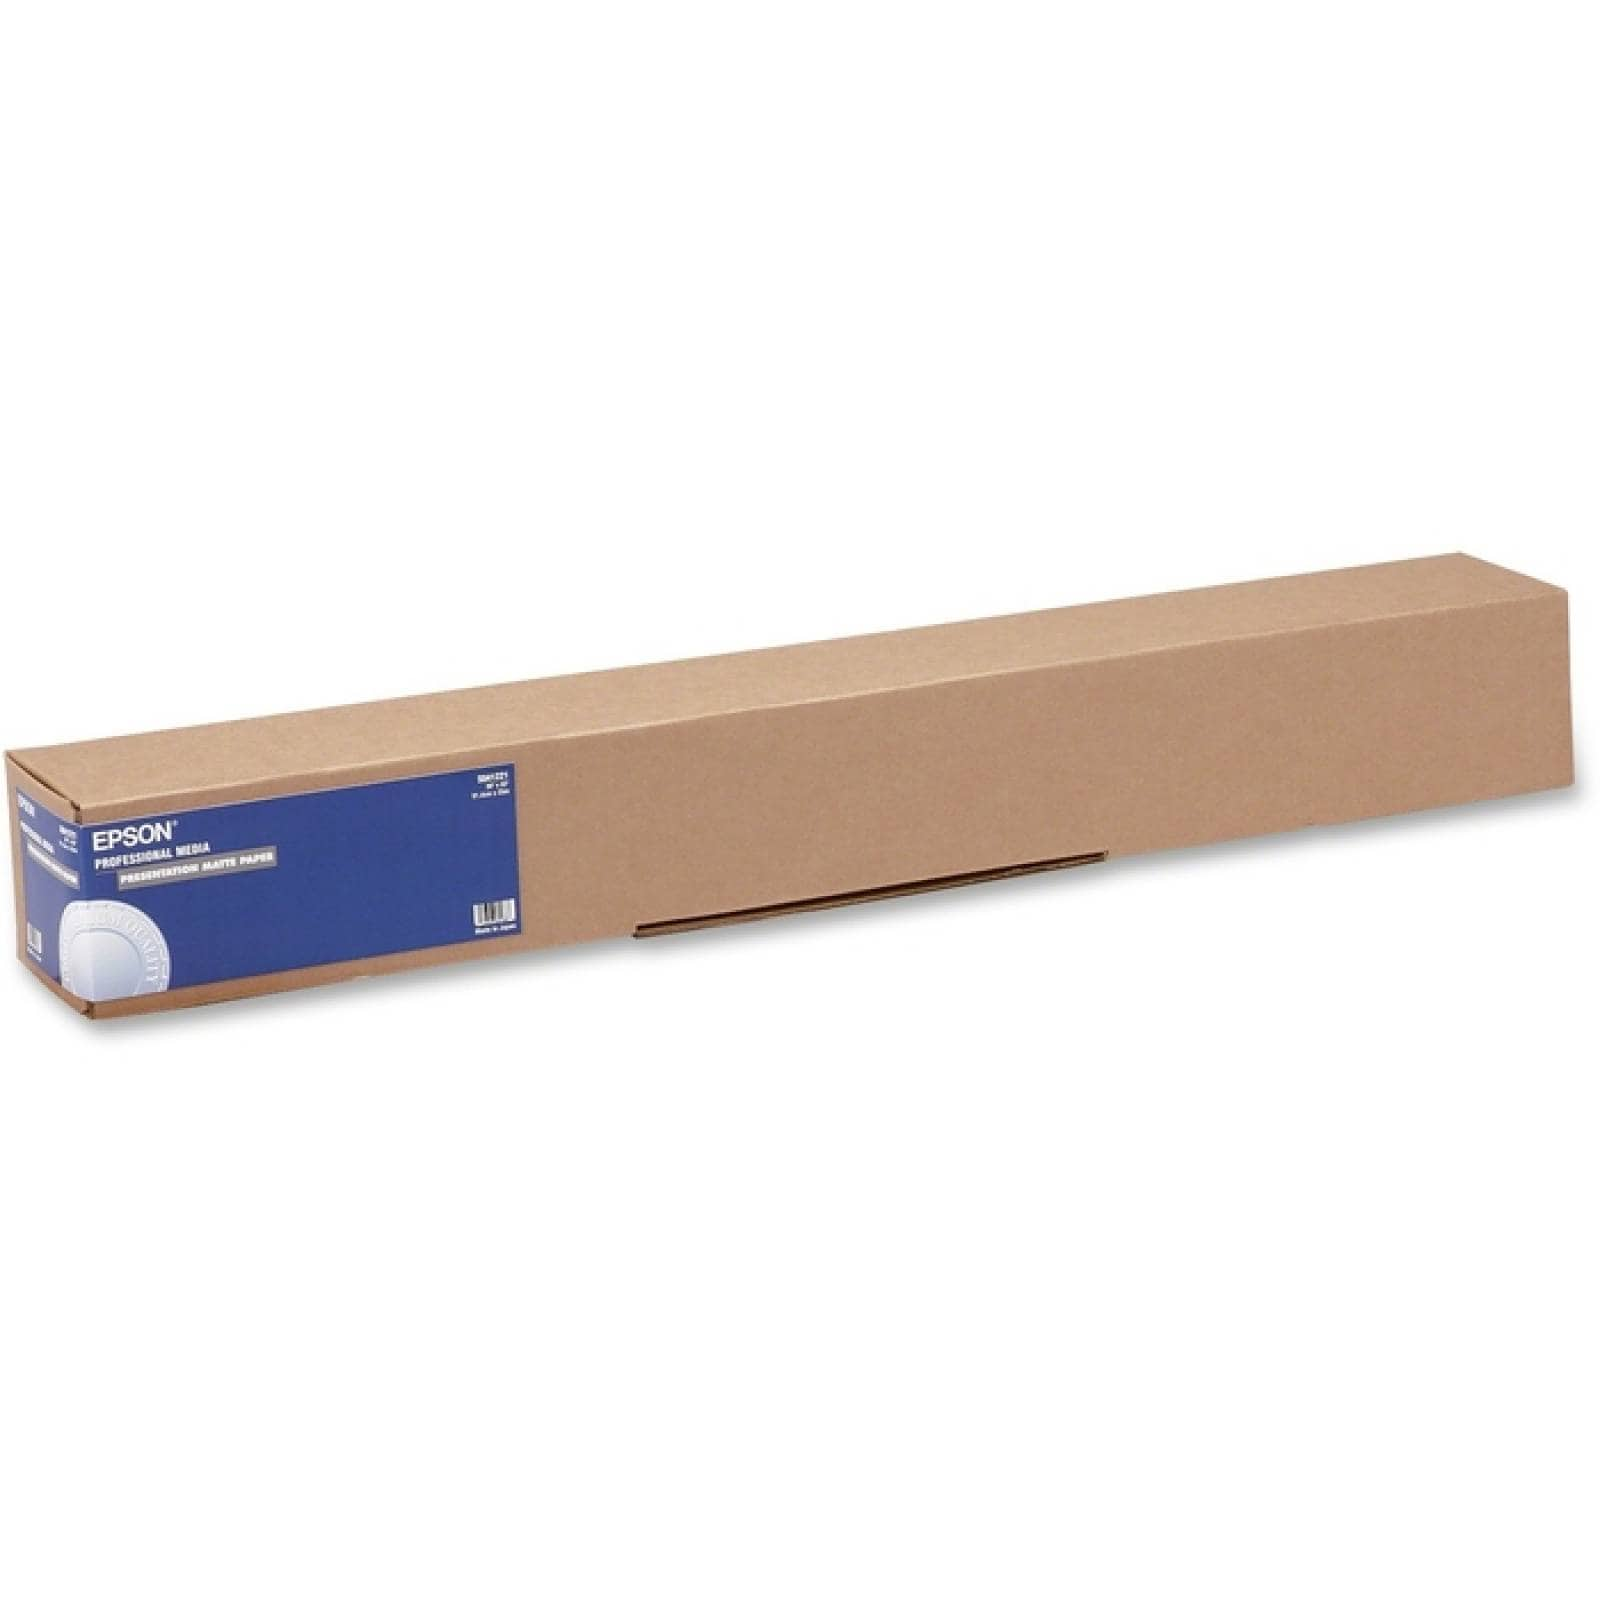 Epson Inkjet Print papel mate